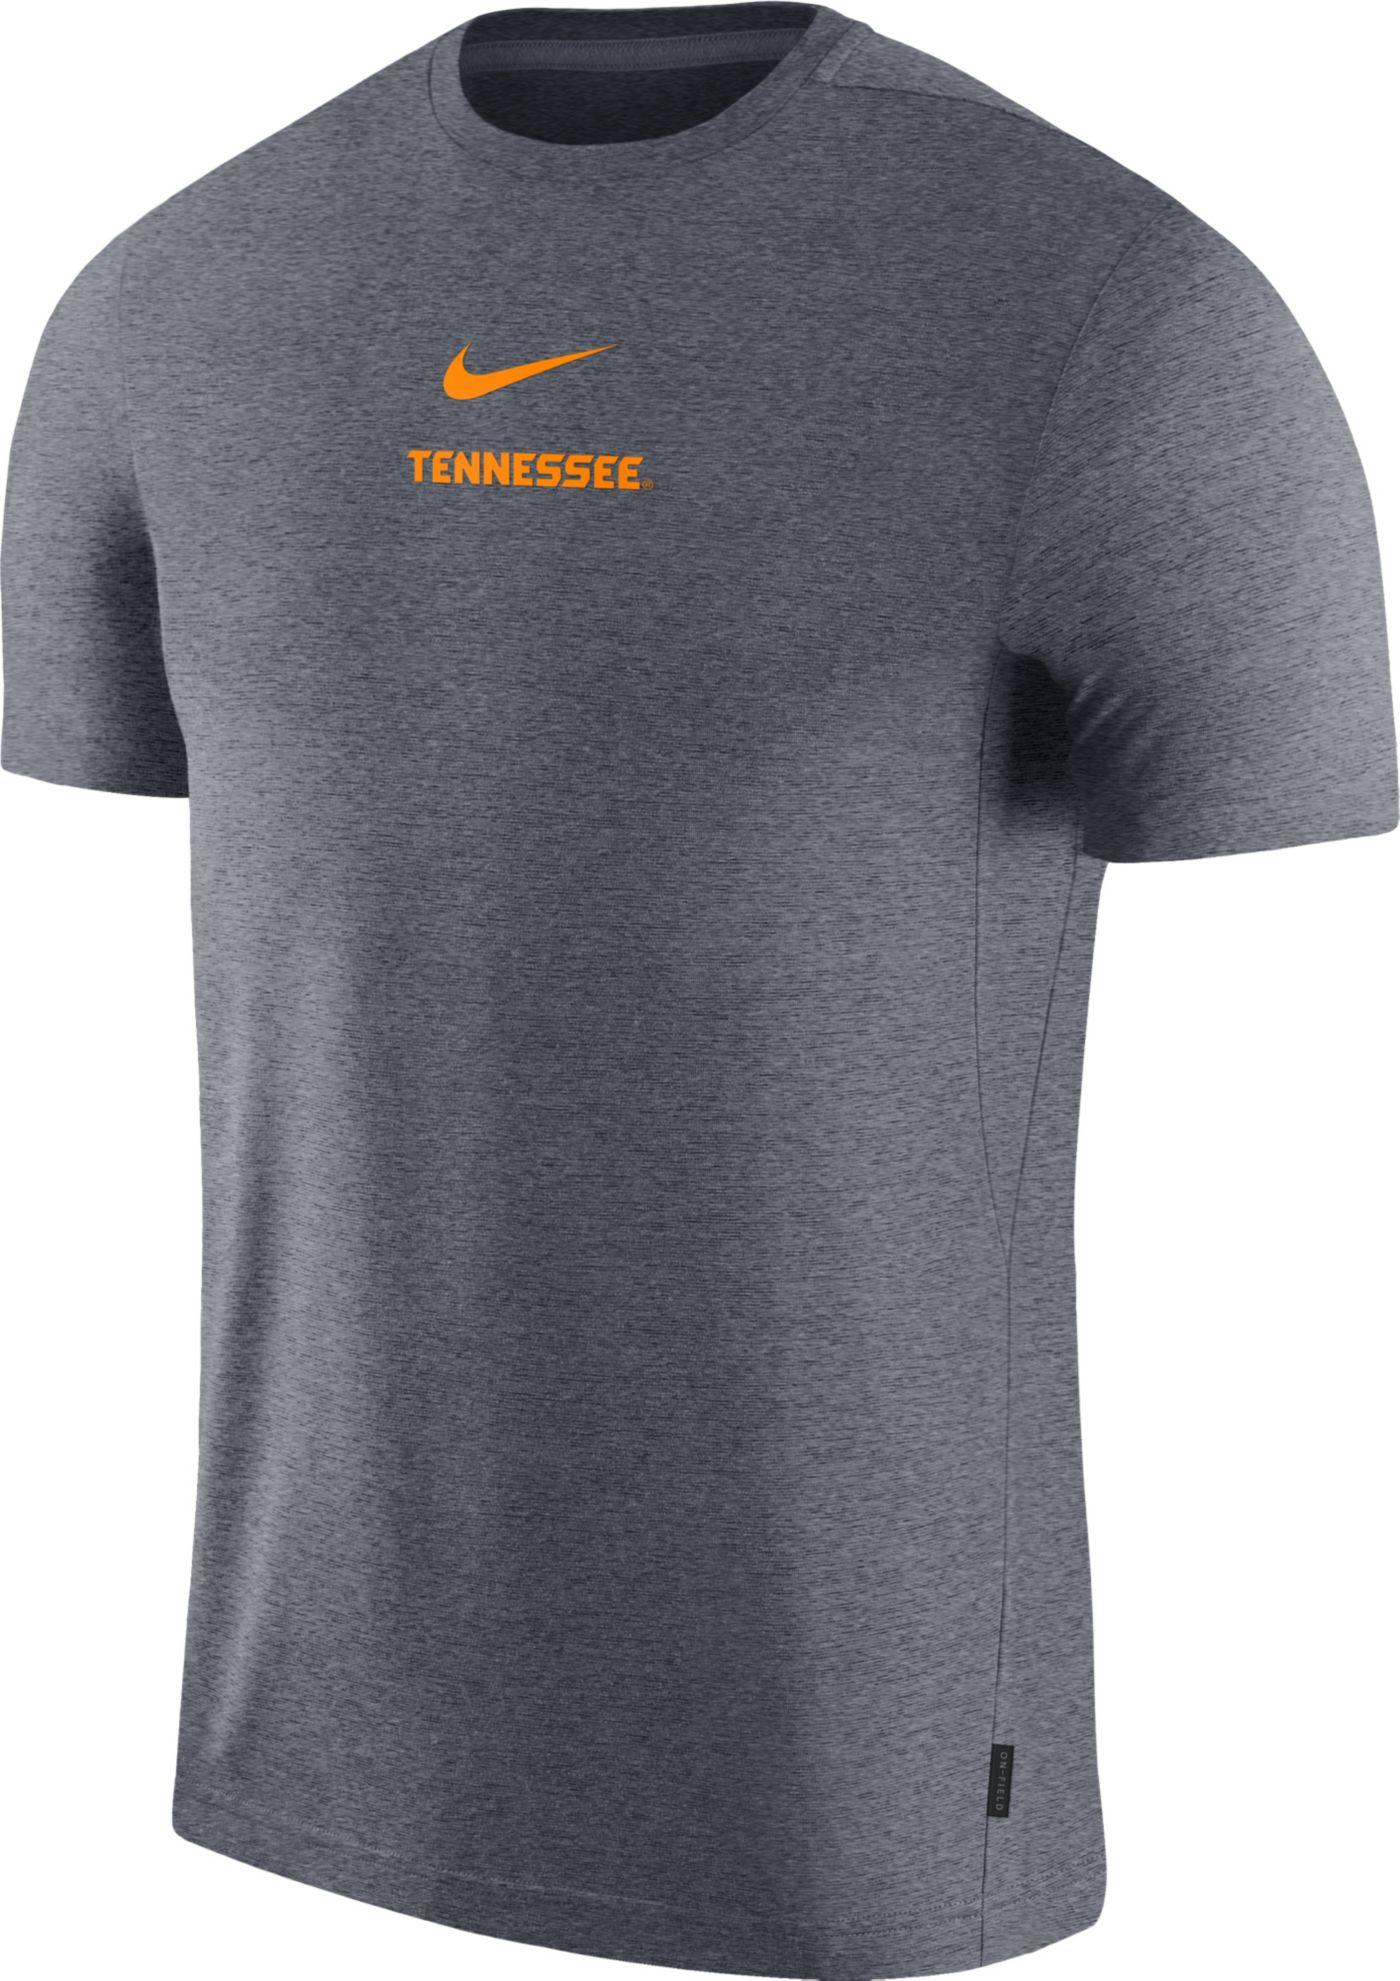 Nike Men's Tennessee Volunteers Grey Dri-FIT Coach UV Football T-Shirt